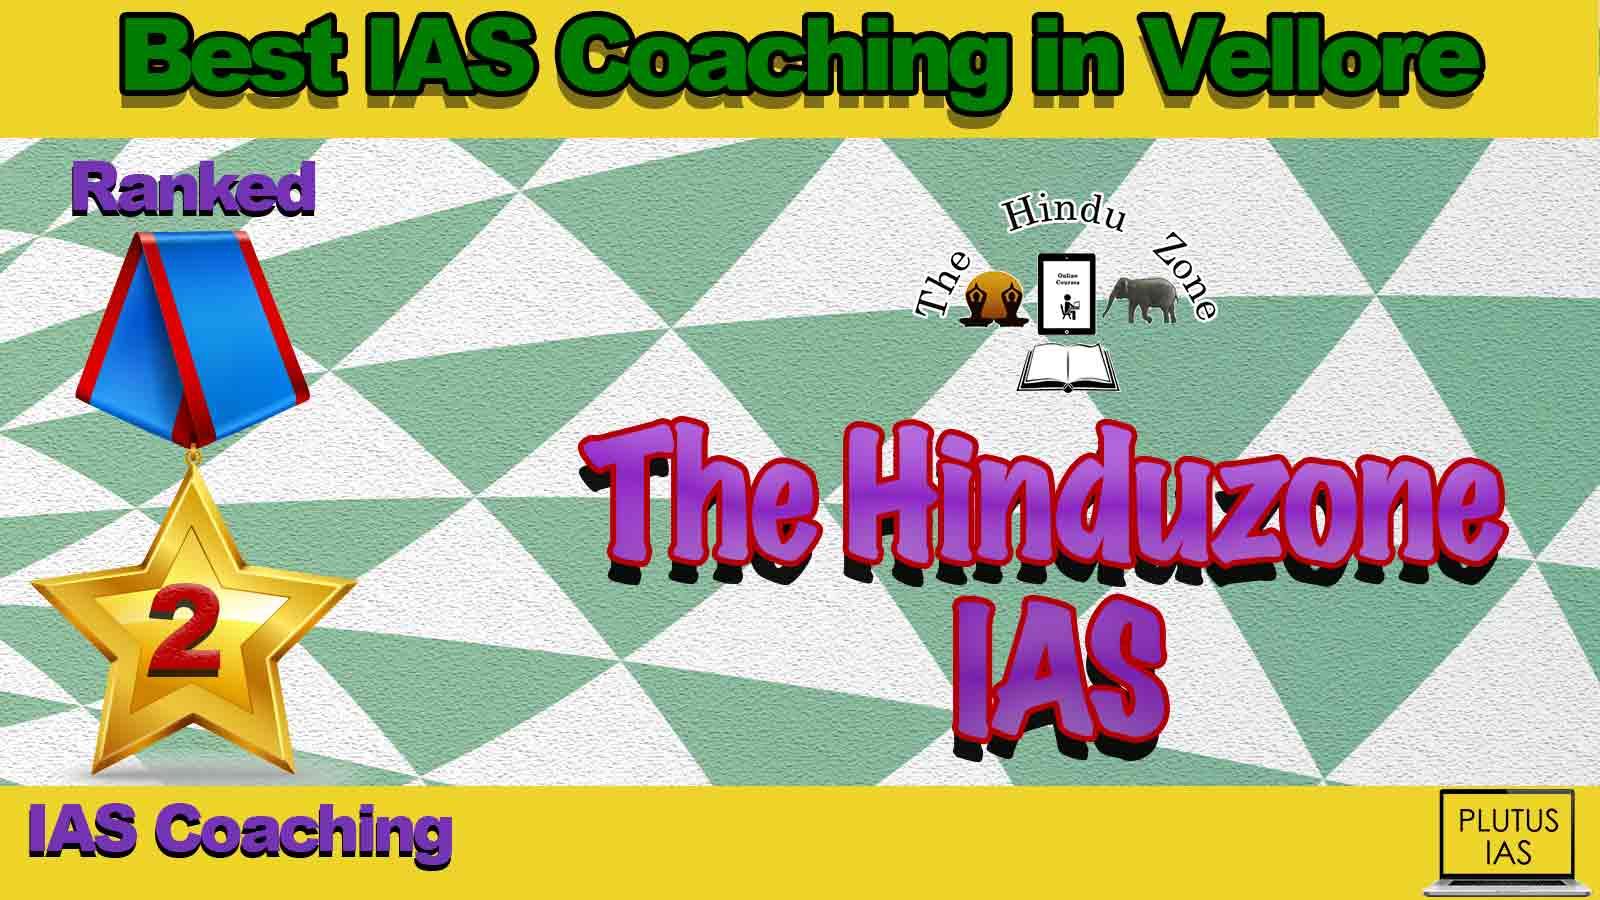 Best IAS Coaching in Vellore